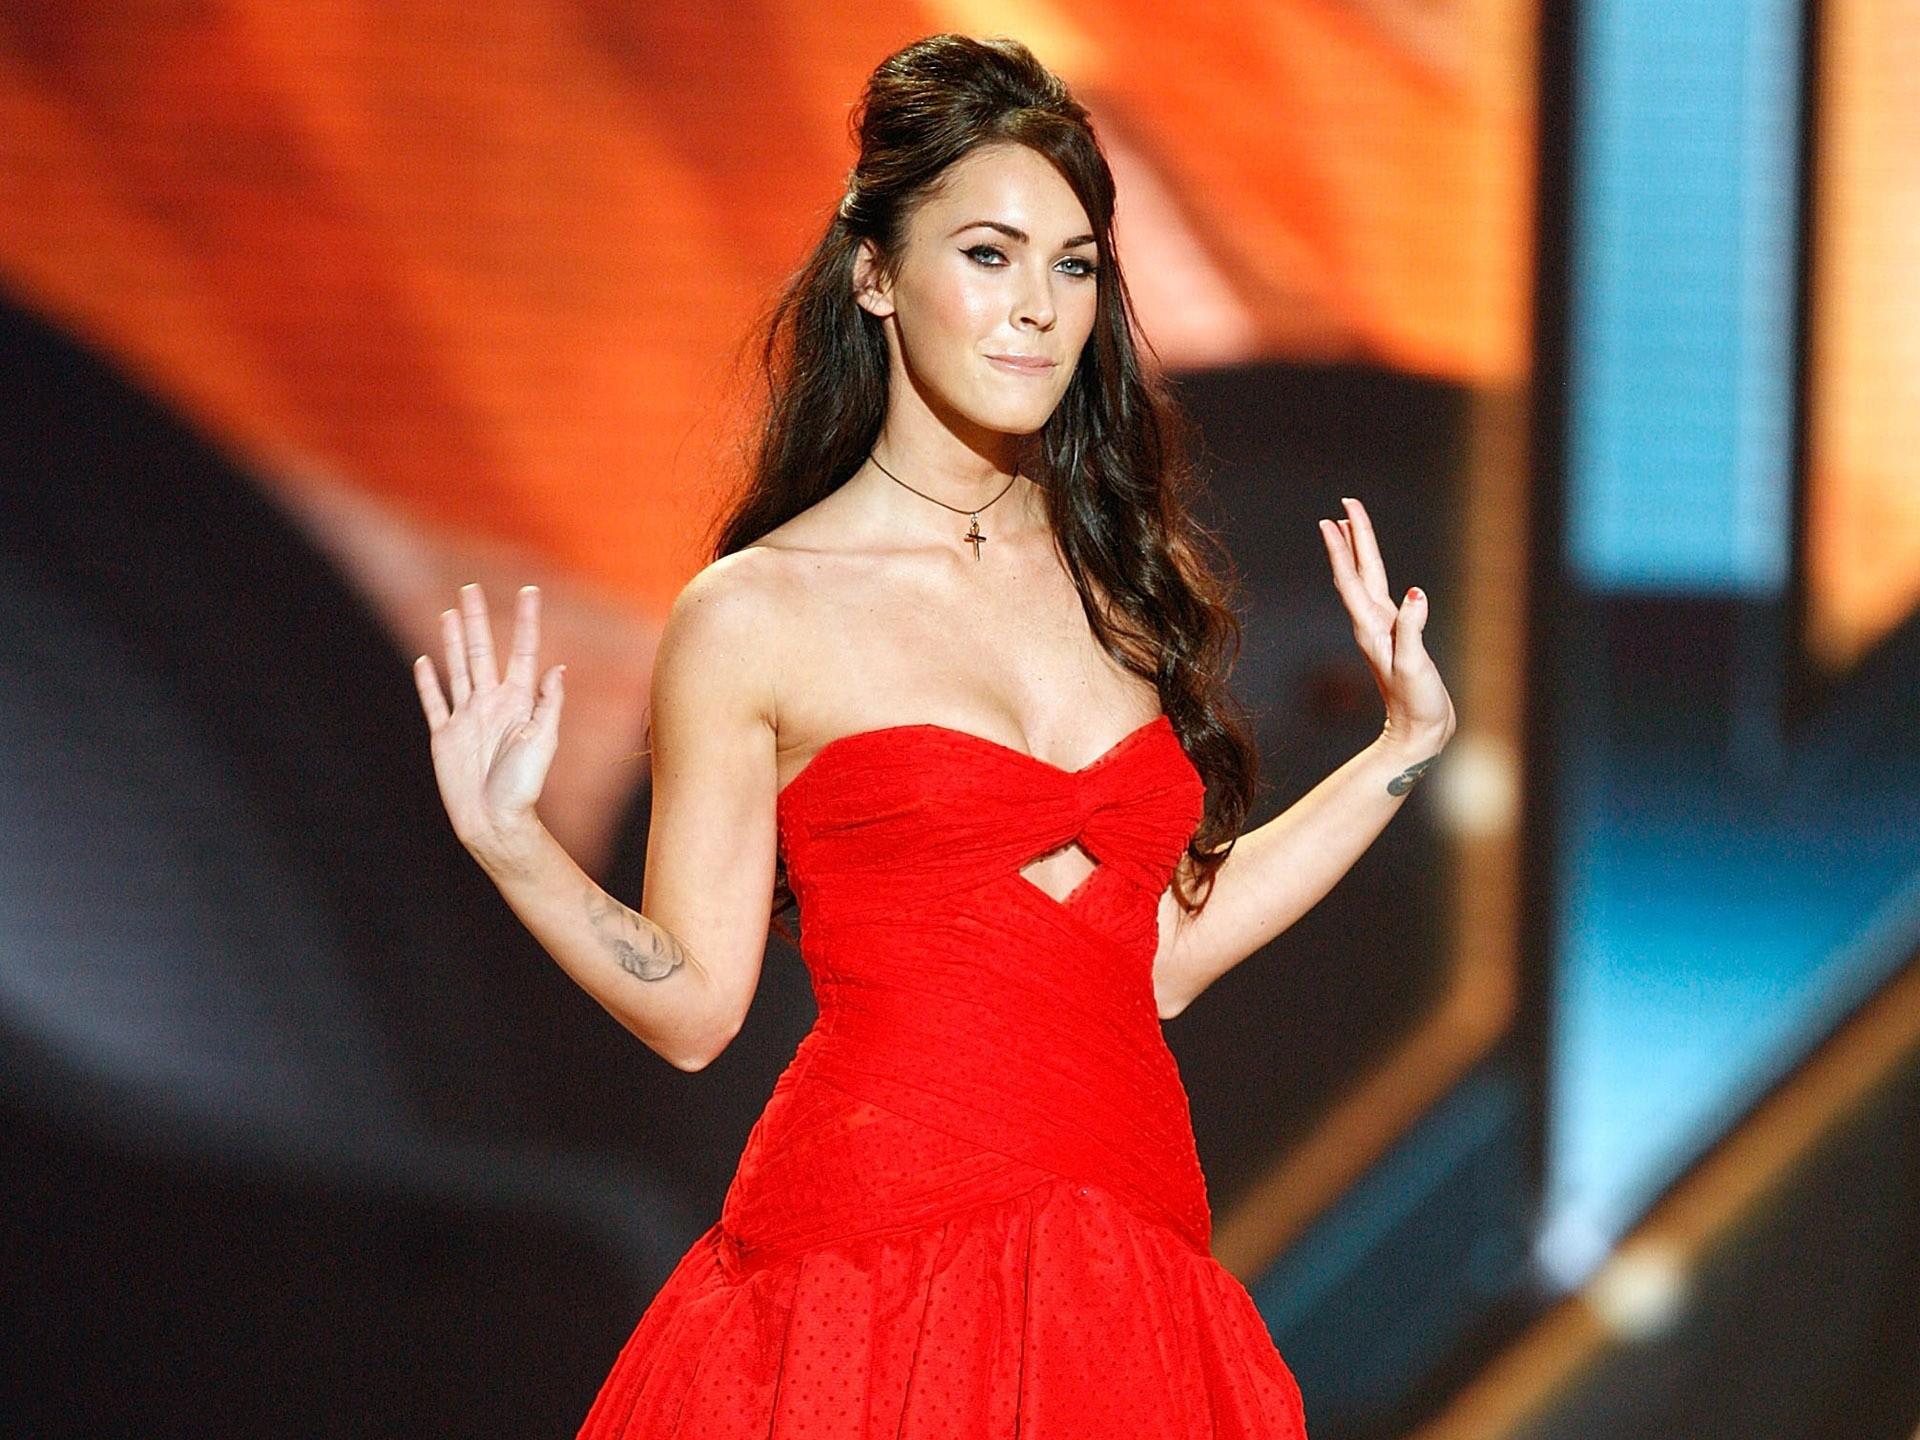 Hintergrundbilder : Frau, Modell-, rot, Kleid, Mode, Megan Fox ...